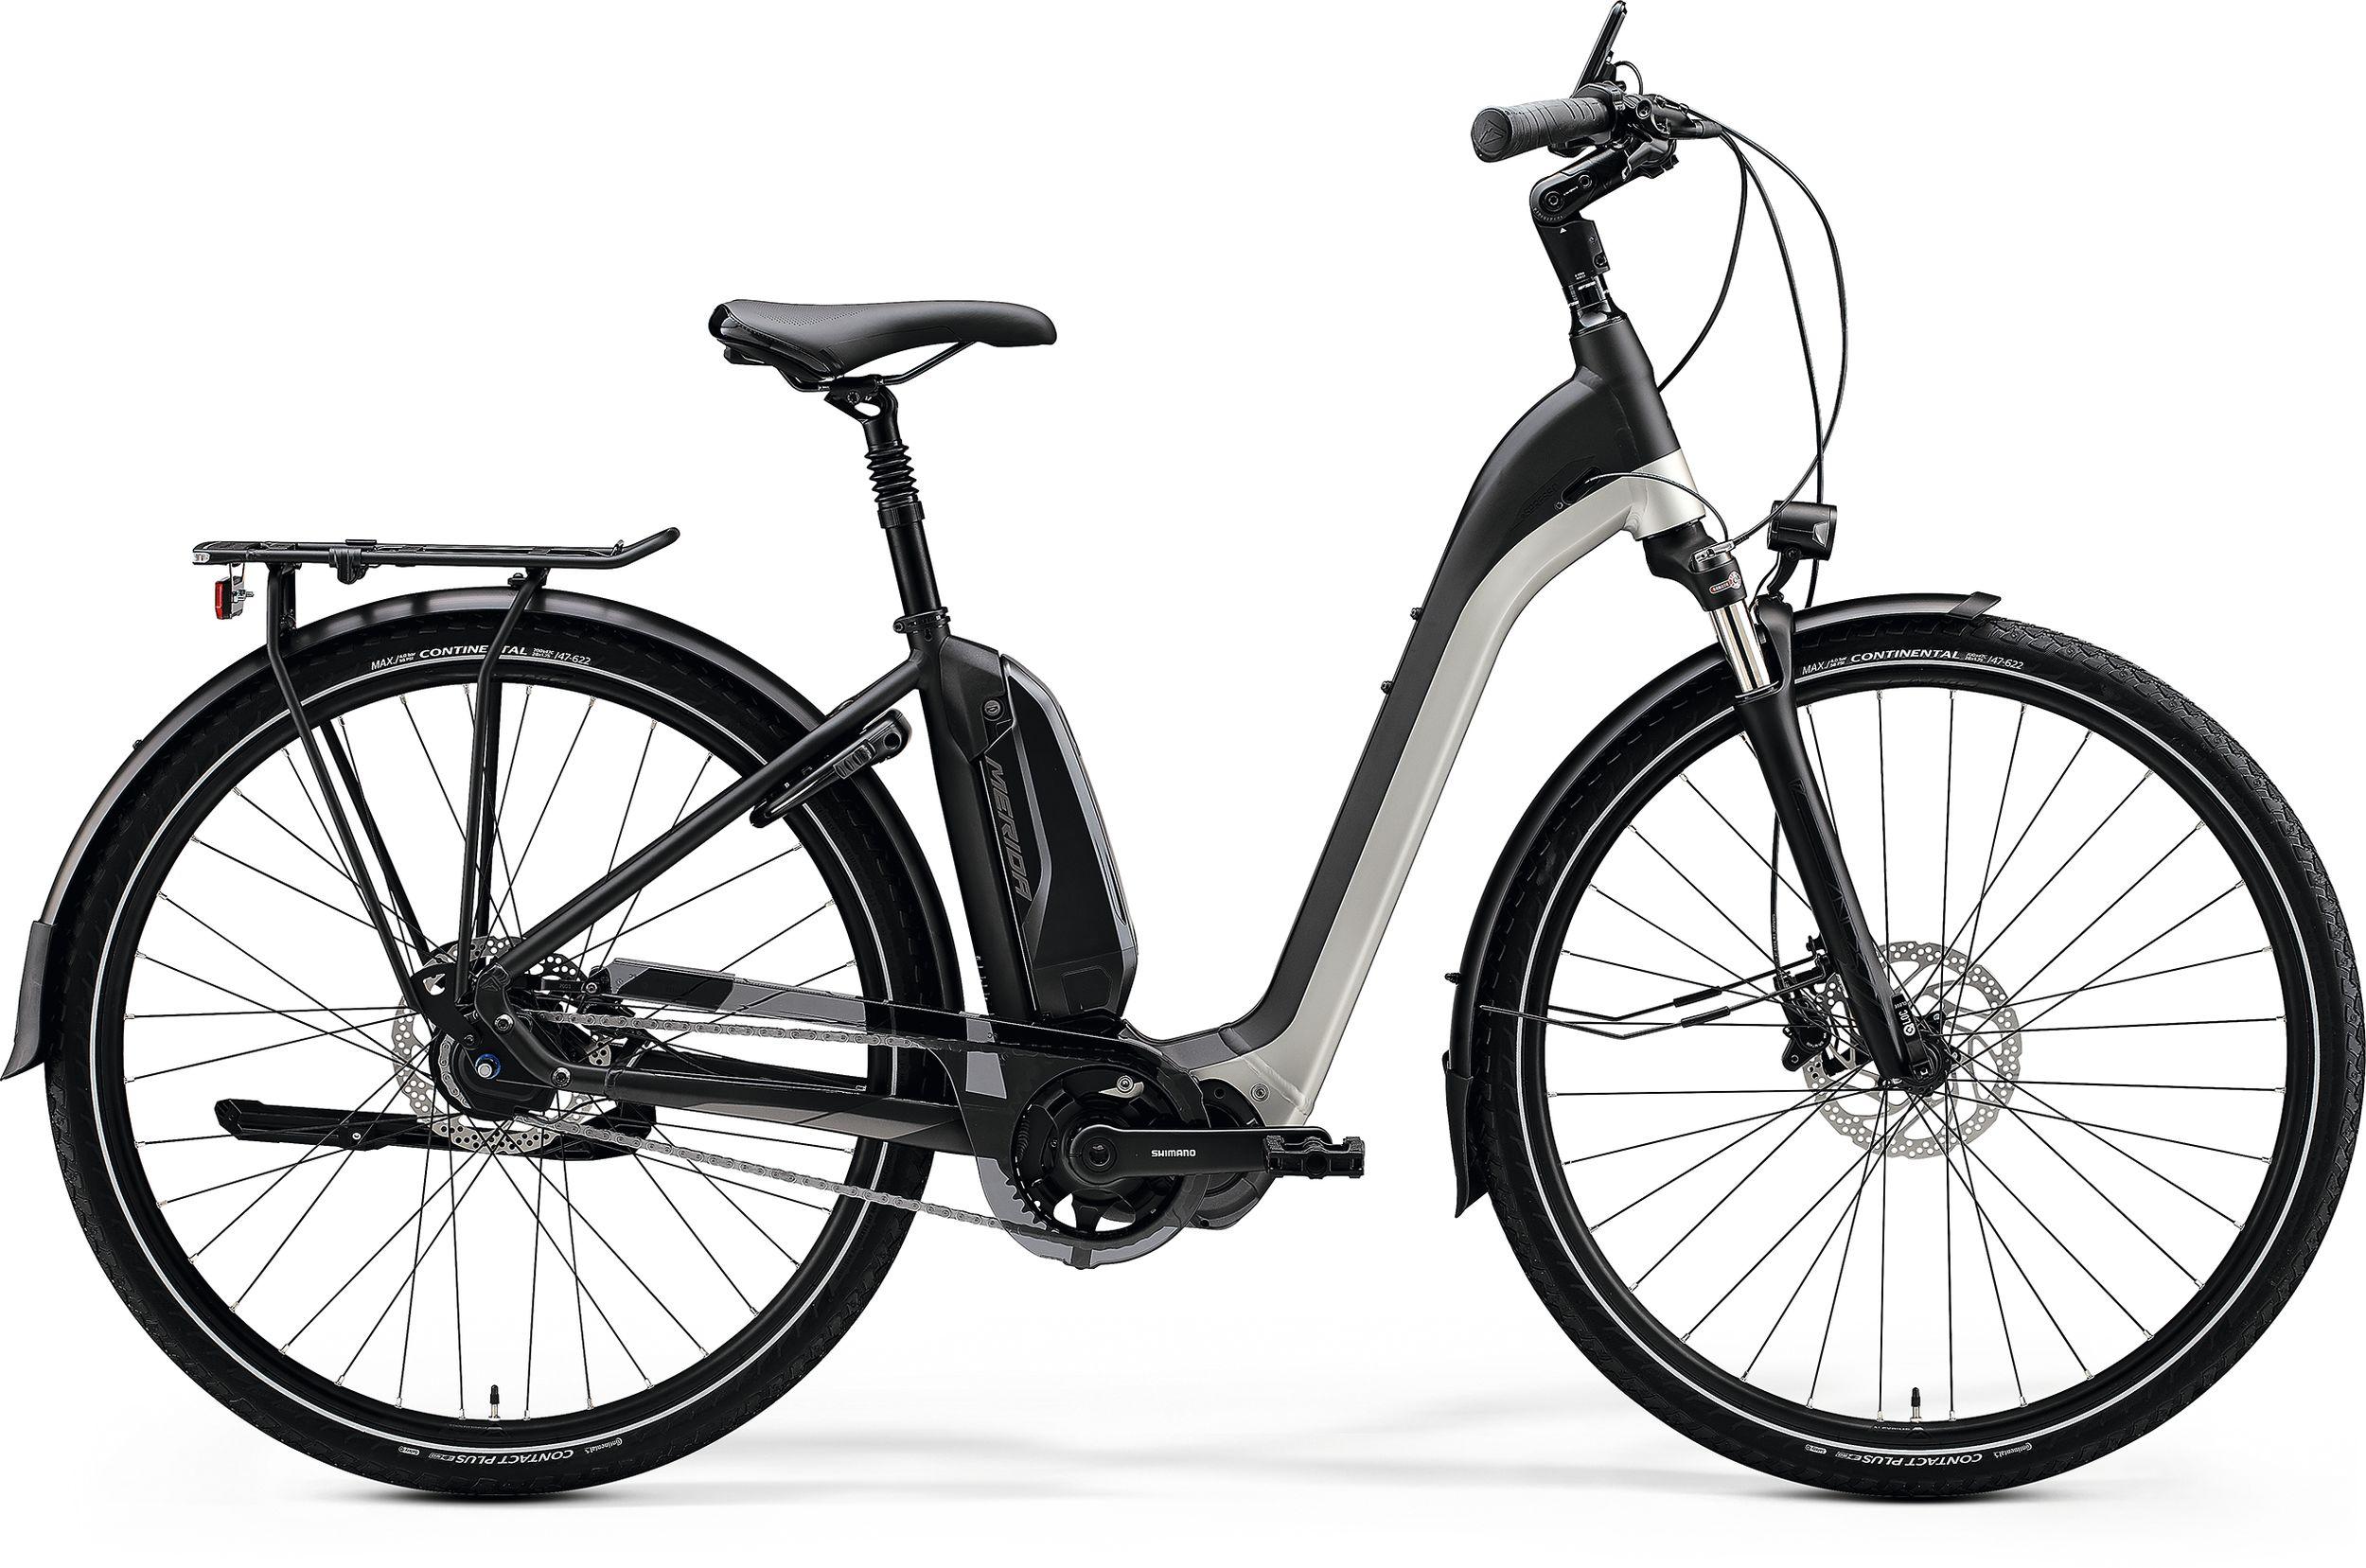 Minitool 12 functions black M-Wave bike tool